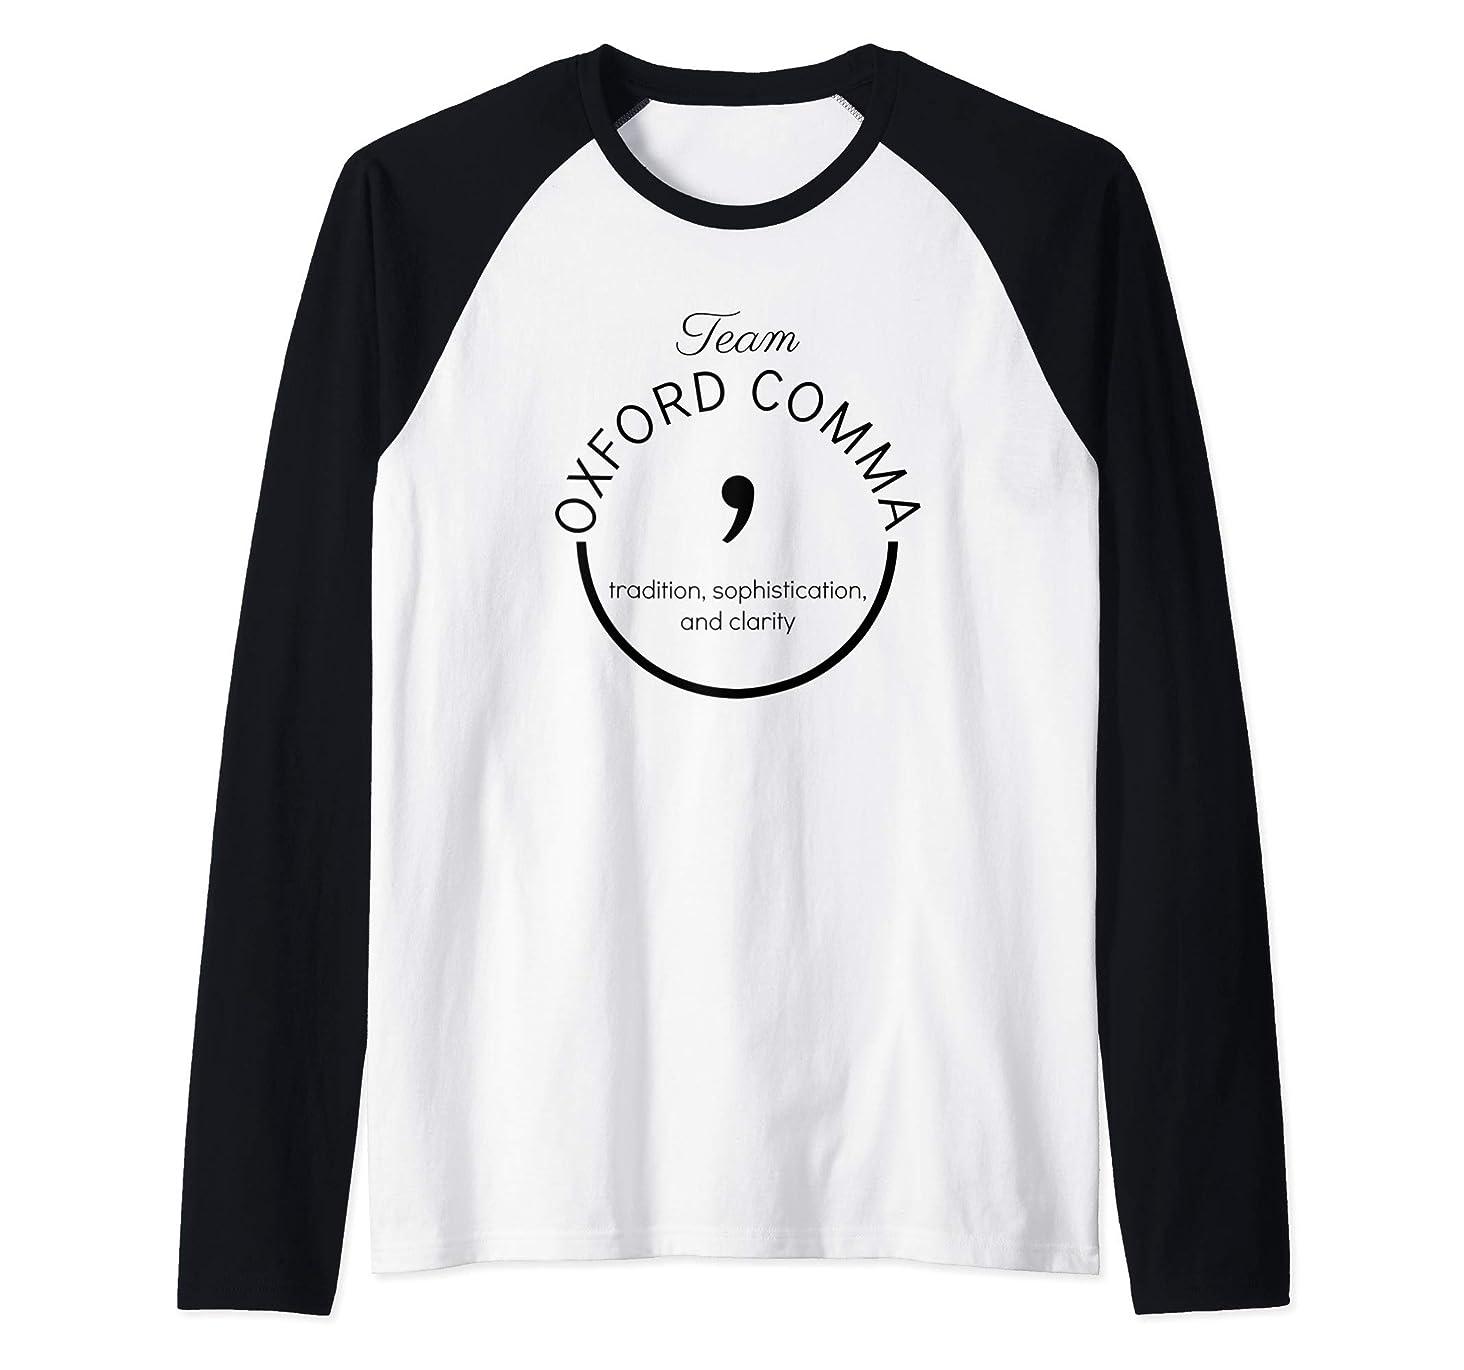 Writer Editor Gift Team Oxford Comma Grammar Police Shirt Raglan Baseball Tee